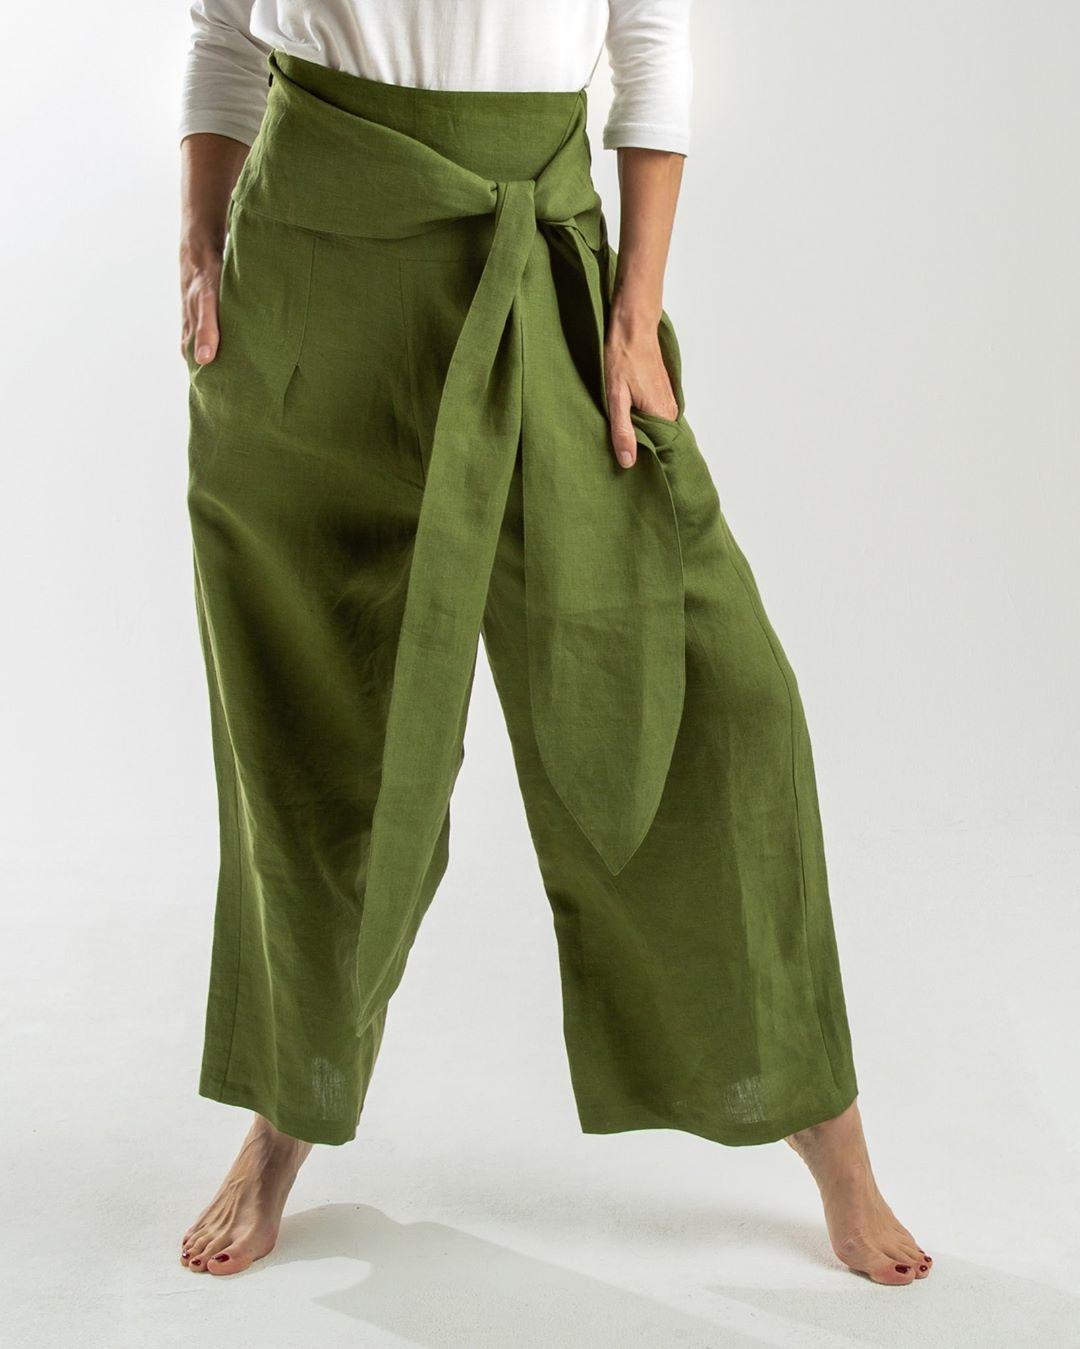 linen wide leg pant with tie detail